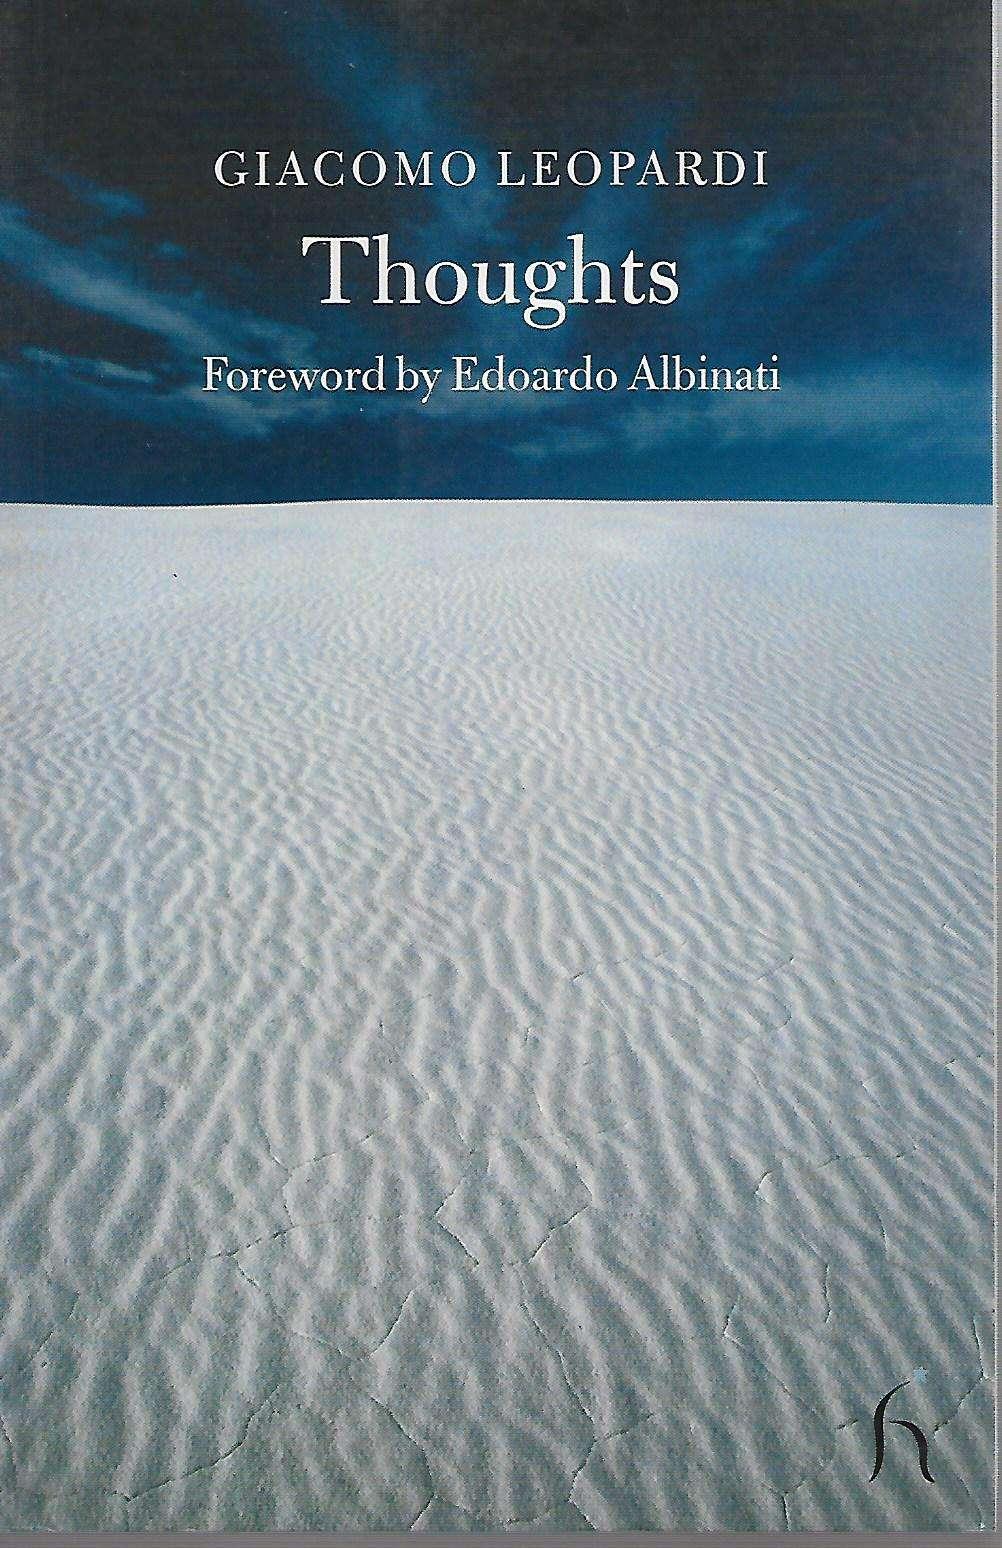 Thoughts (Hesperus Classics), Giacomo Leopardi